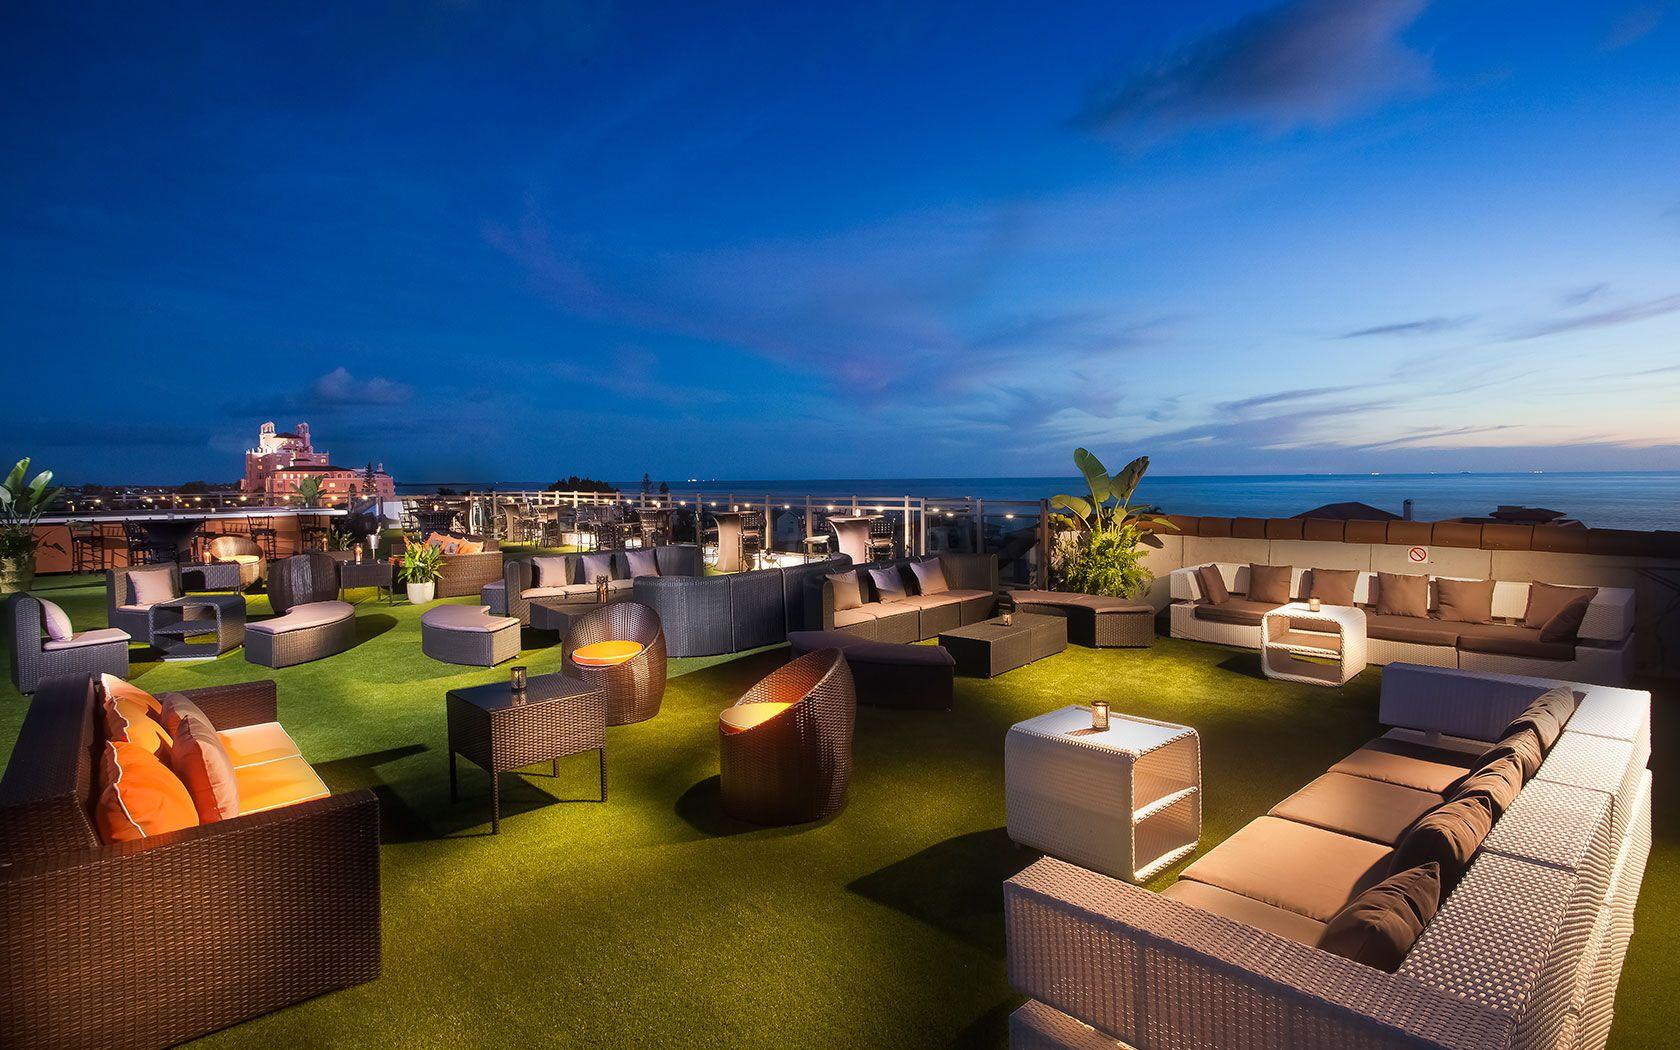 Hotel Zamora 3701 Gulf Blvd St Pete Beach Fl 33706 From 190